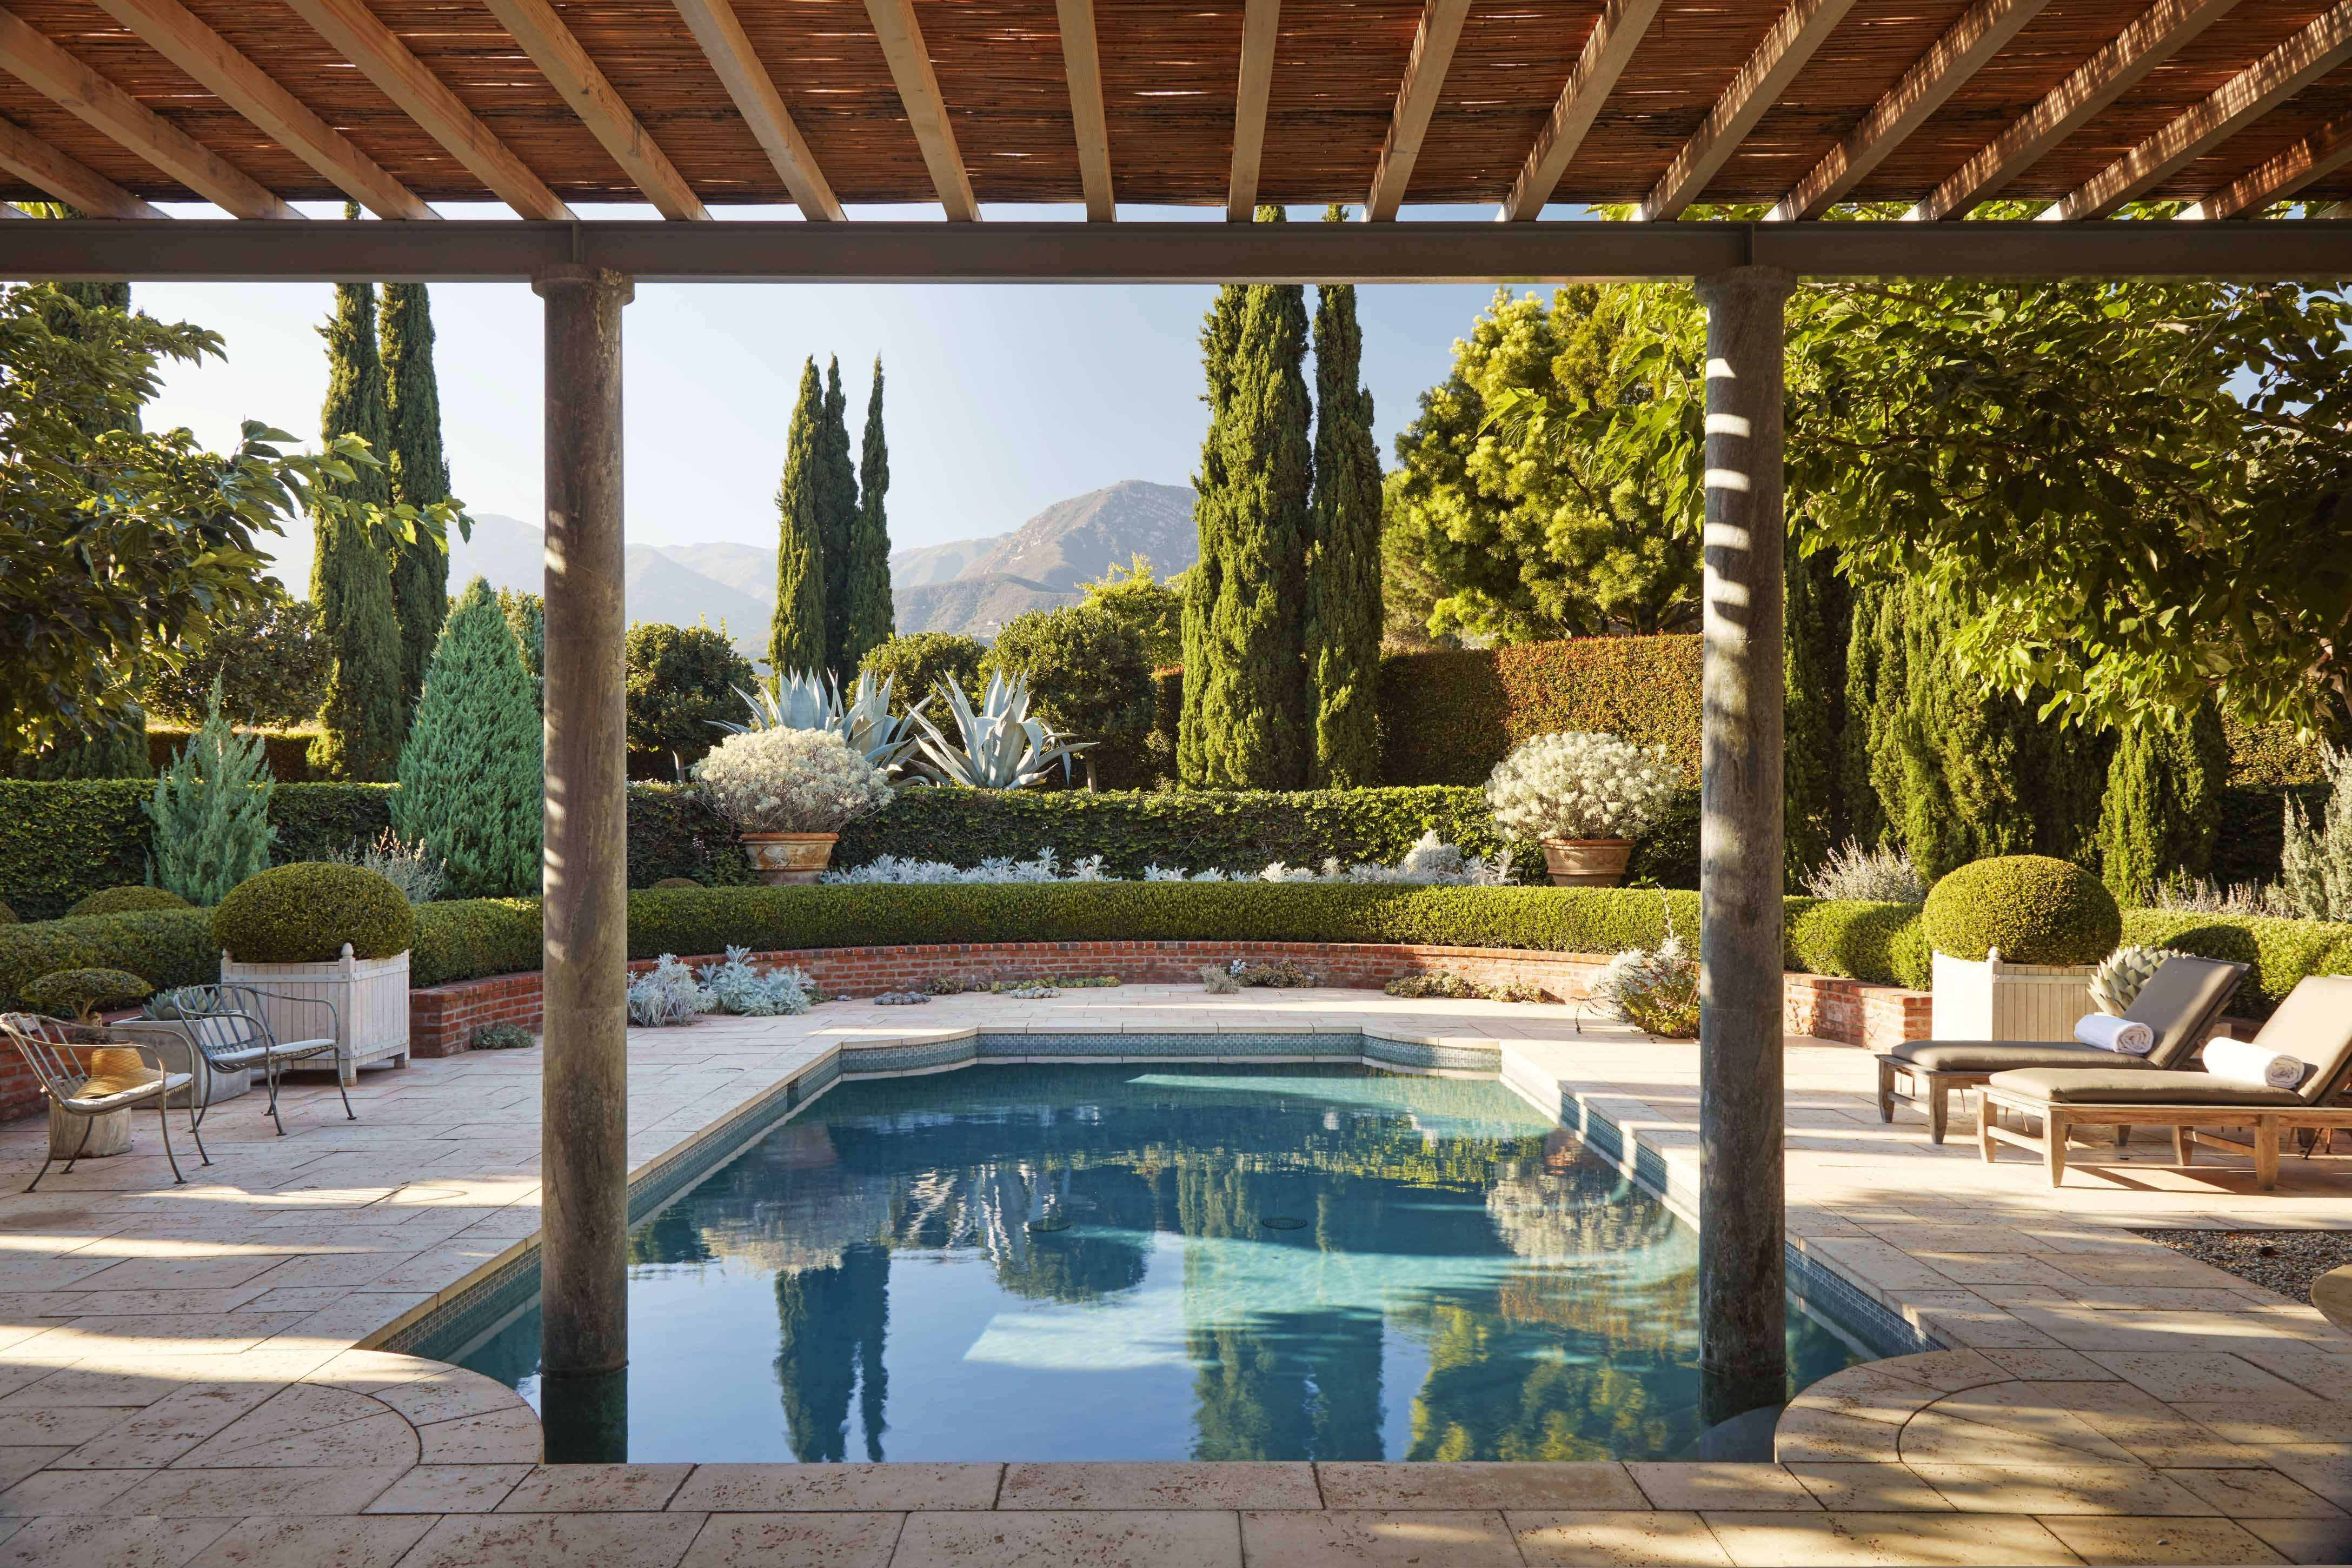 30 best swimming pool designs 2021